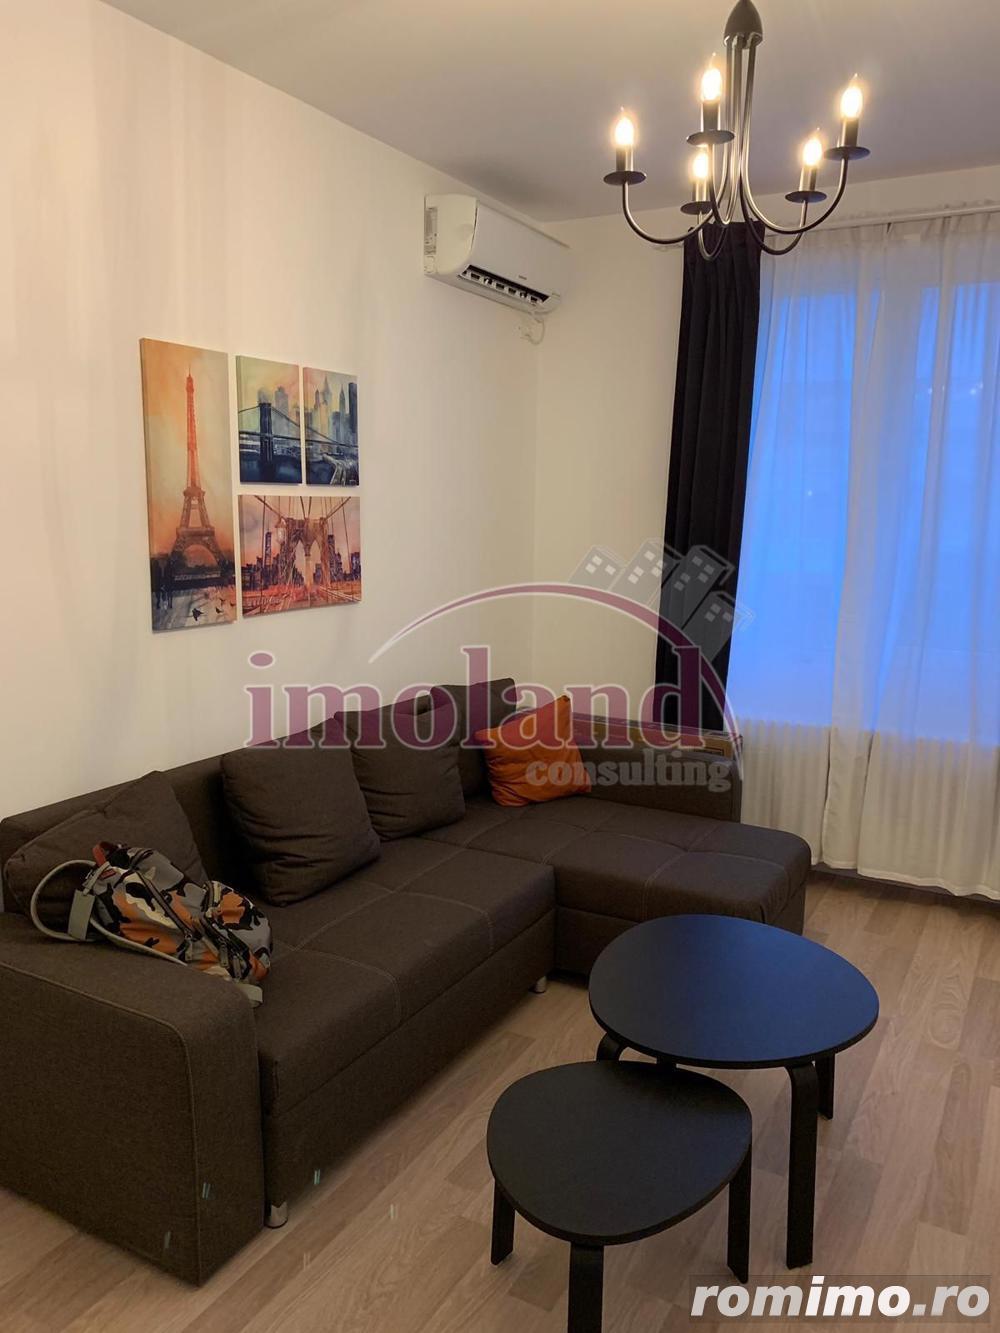 Apartament 2 camere - INCHIRIERE - Floreasca / Glinka